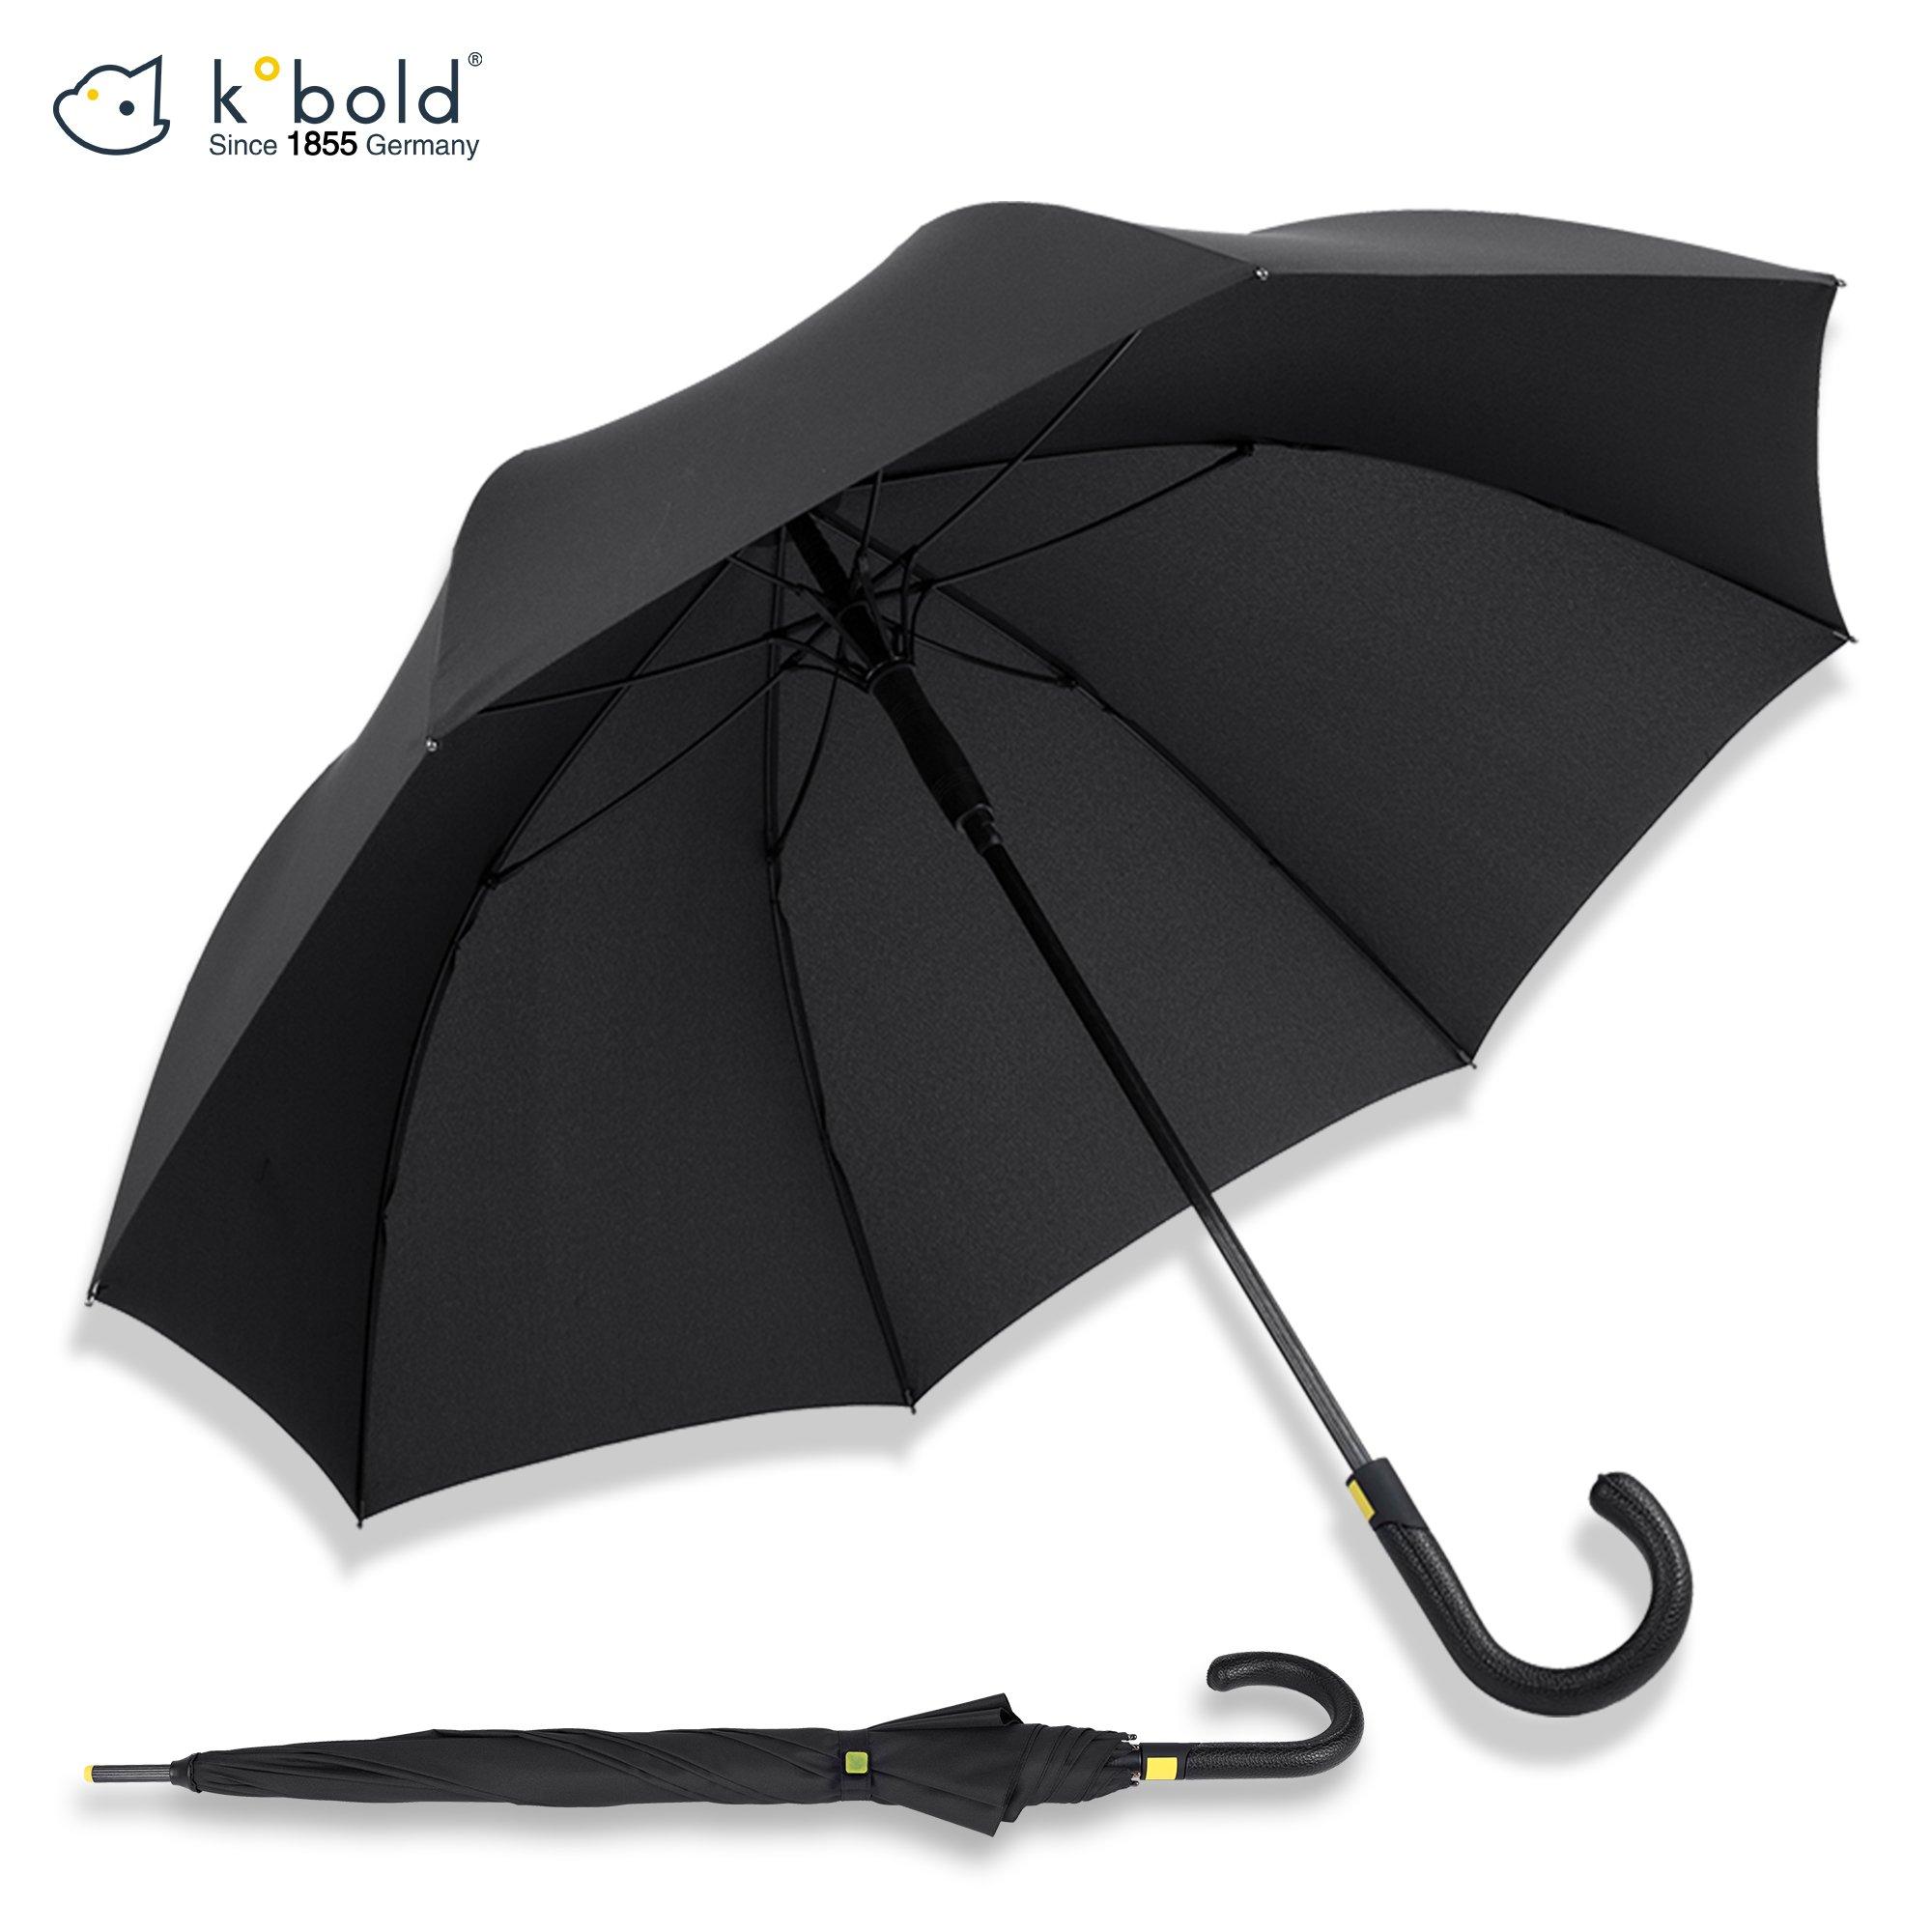 Kobold Stick Umbrella Unisex Auto Open Storm Resistant Windproof Fiberglass frame Umbreakable